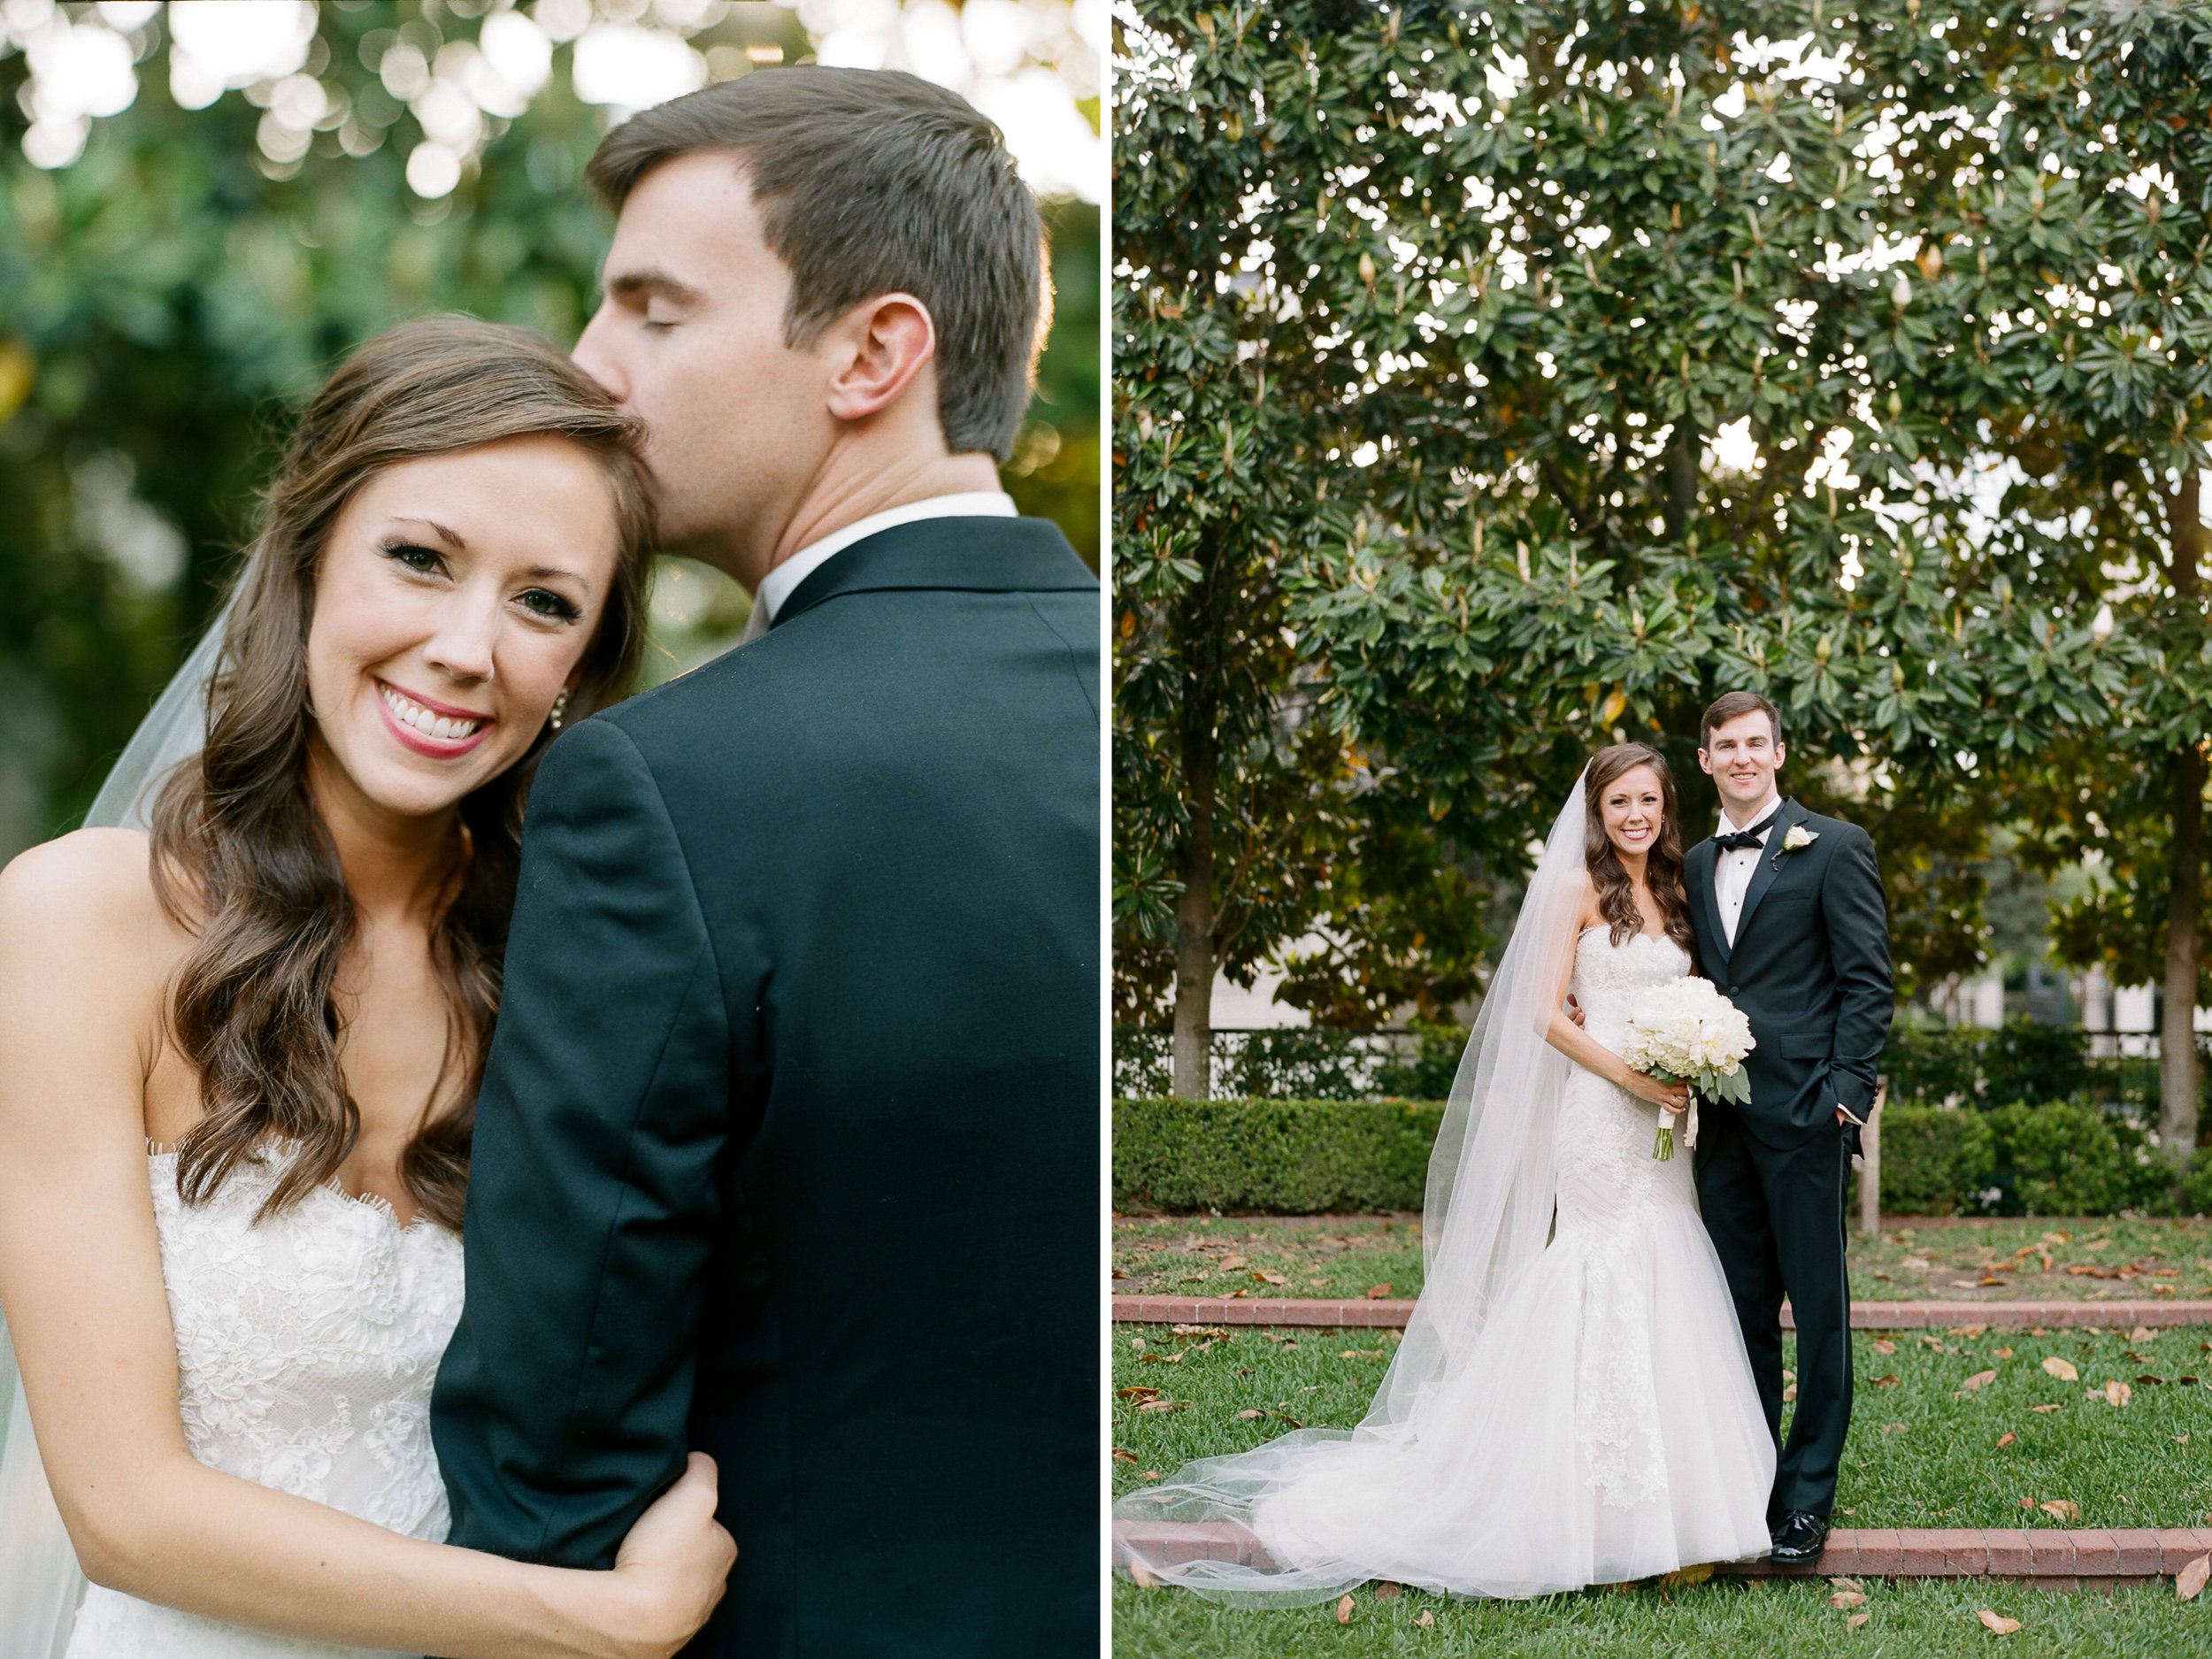 St.-Philip-Presbyterian-Church-Houston-Wedding-Ceremony-The-Junior-League-Of-Houston-Reception-Dana-Fernandez-Photography-Fine-Art-Film-112.jpg